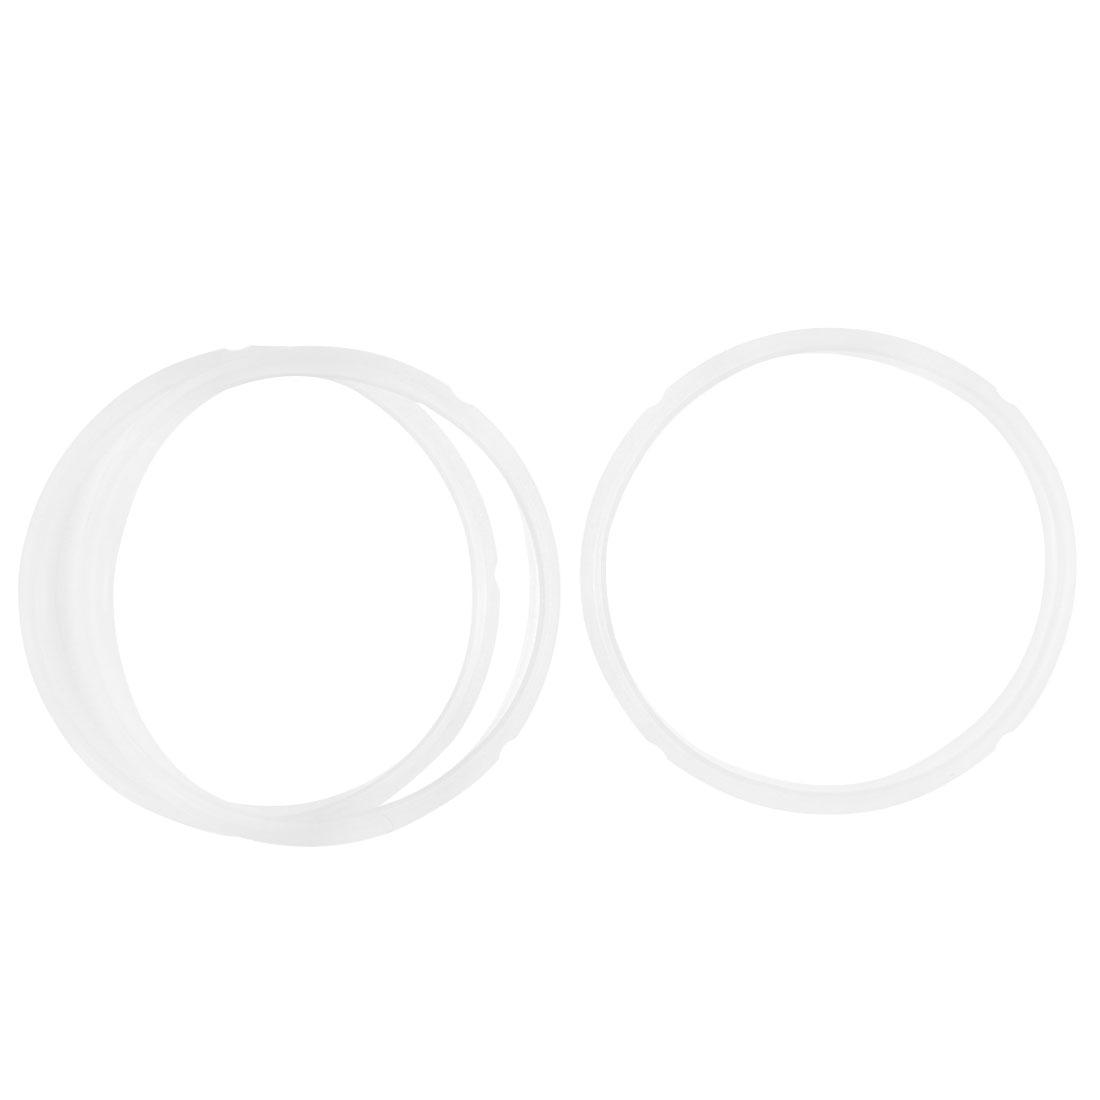 Gasket Sealing Ring for 3-4L Cooker Clear White 20cm Inner Dia 3 Pcs